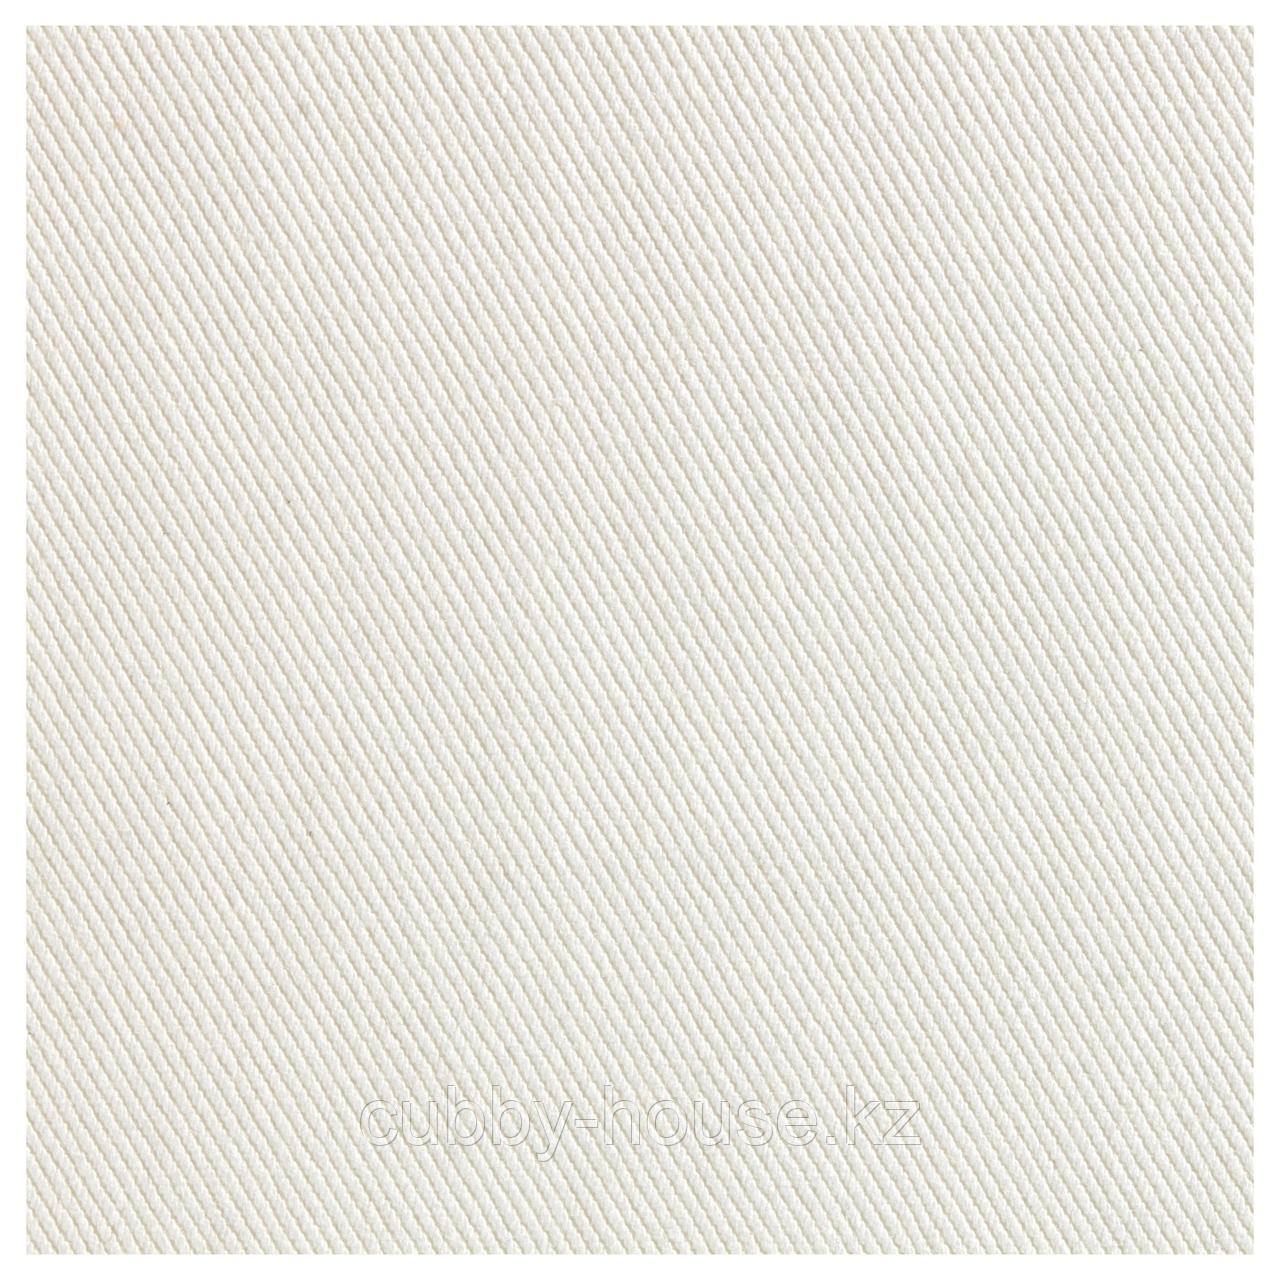 ЮПВИК Подушка, Блекинге белый, 54x54 см - фото 3